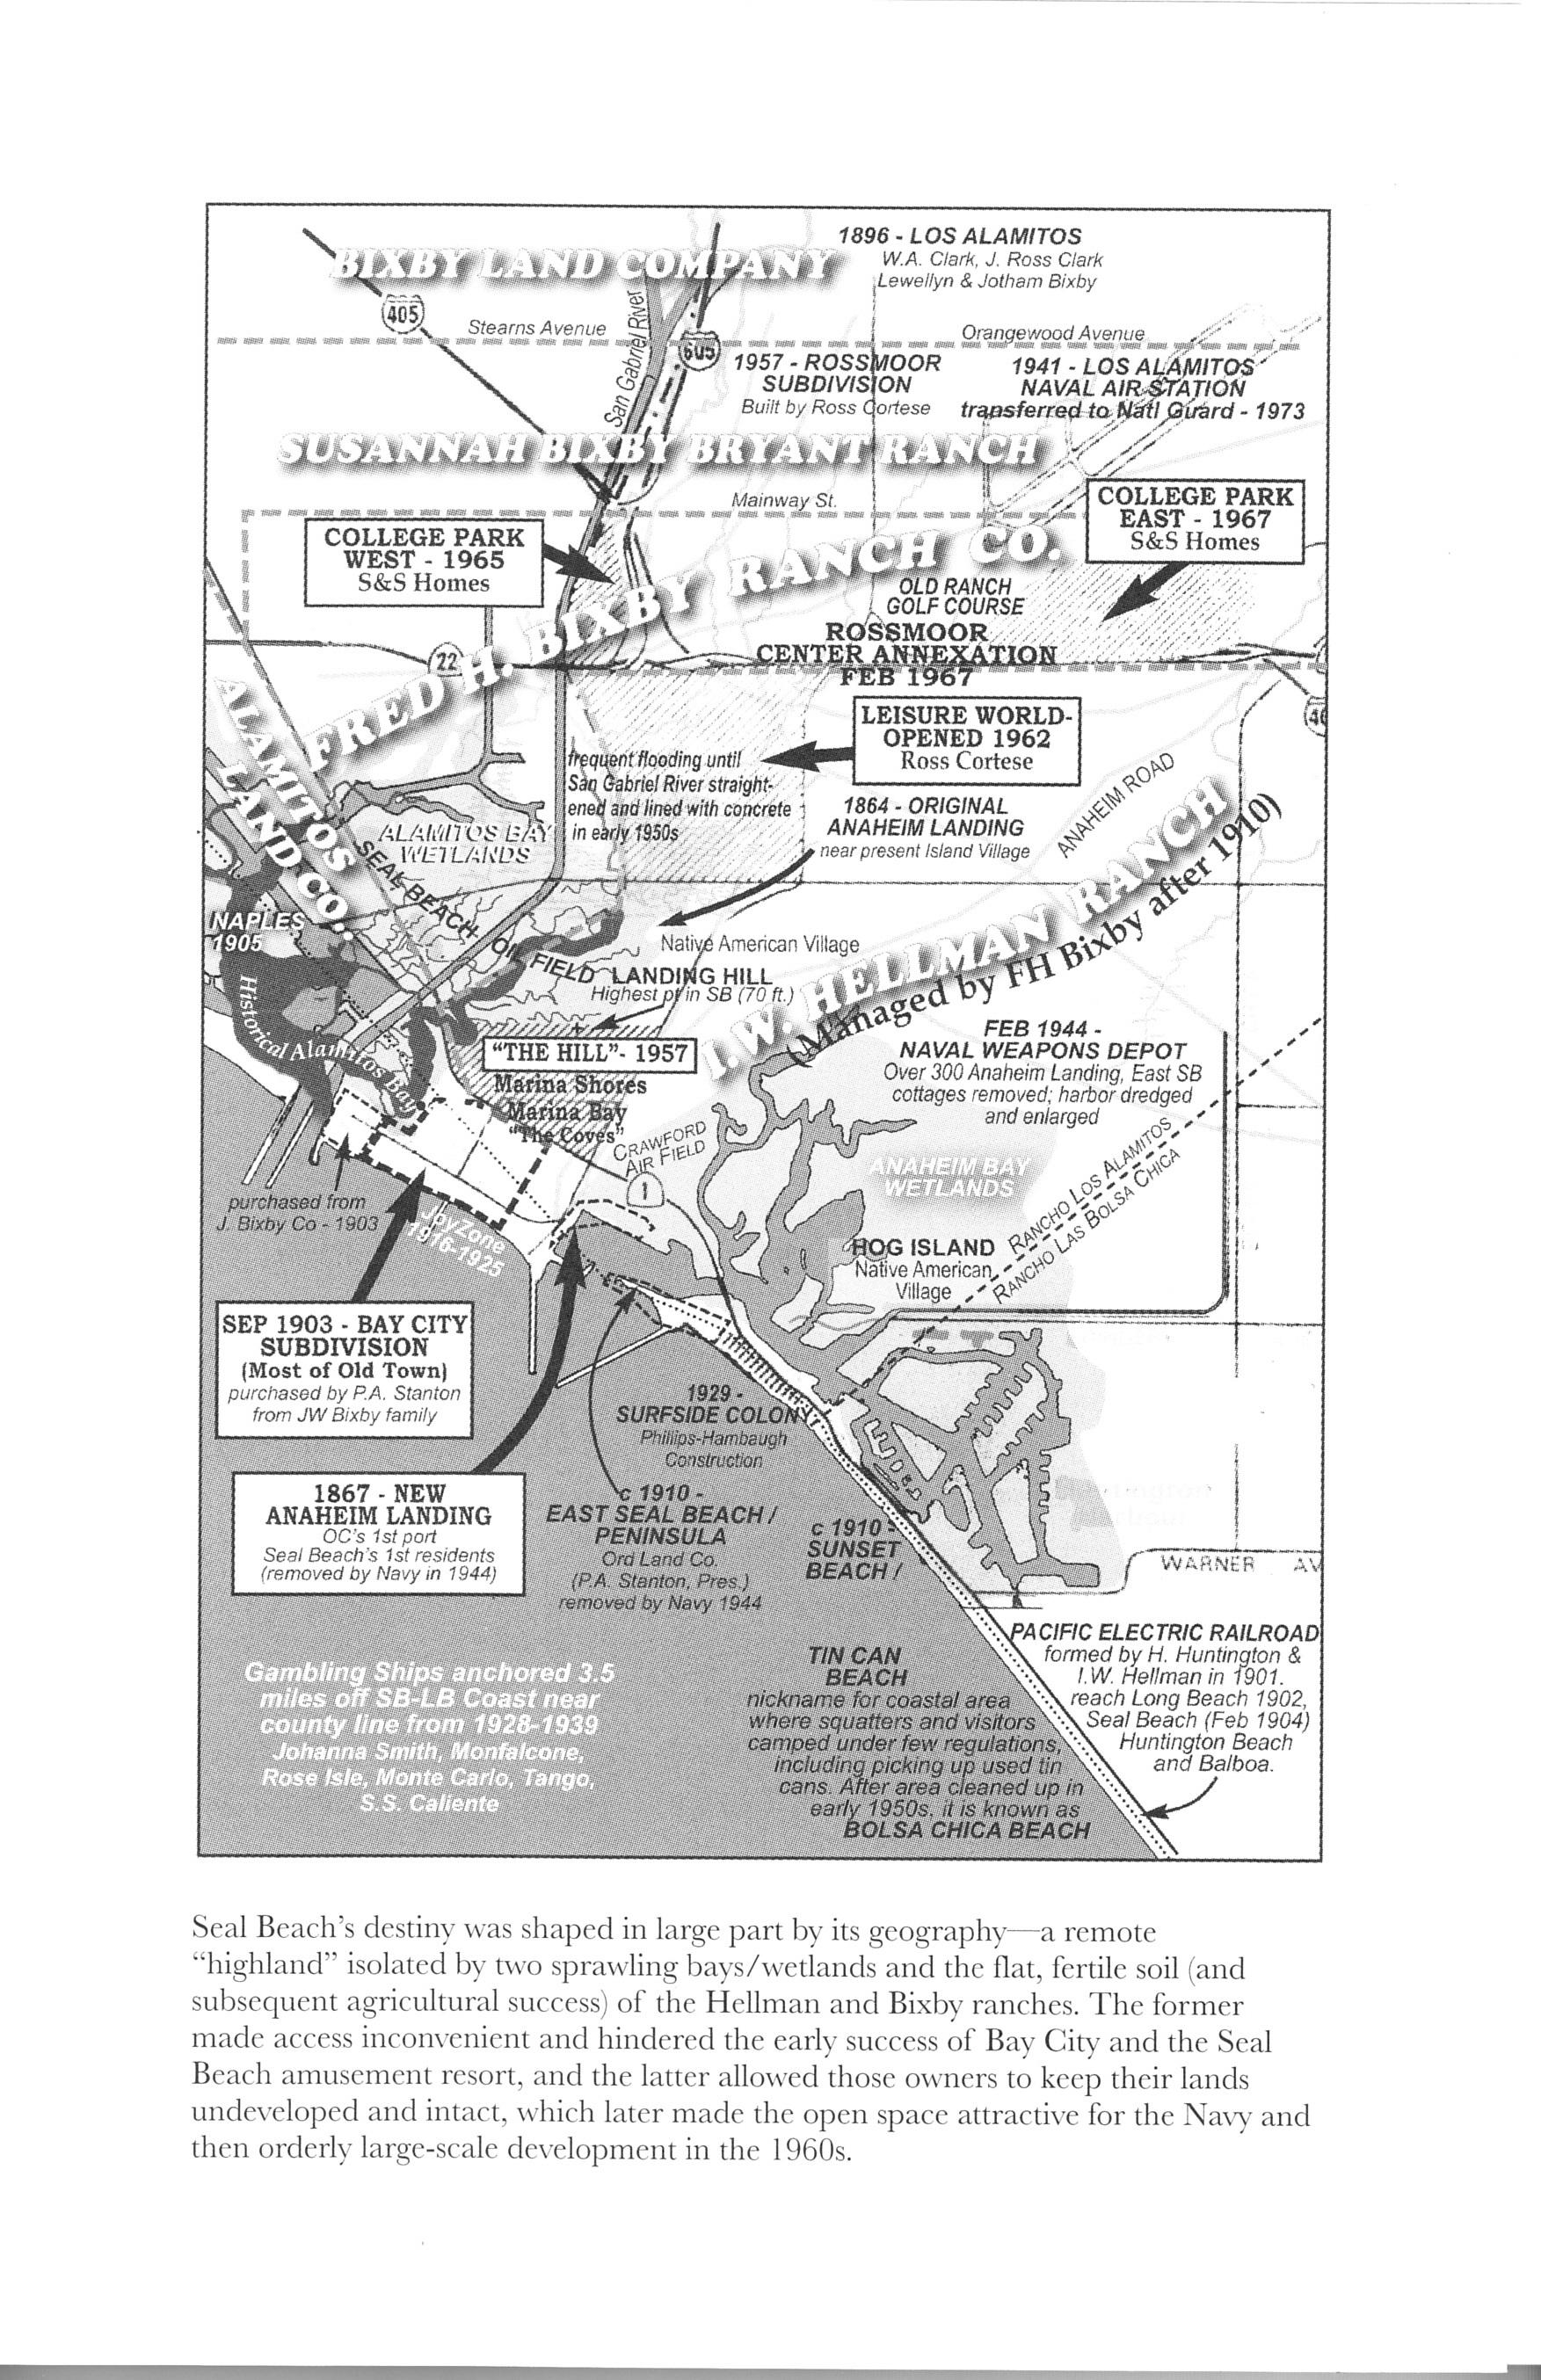 Seal beach book image map